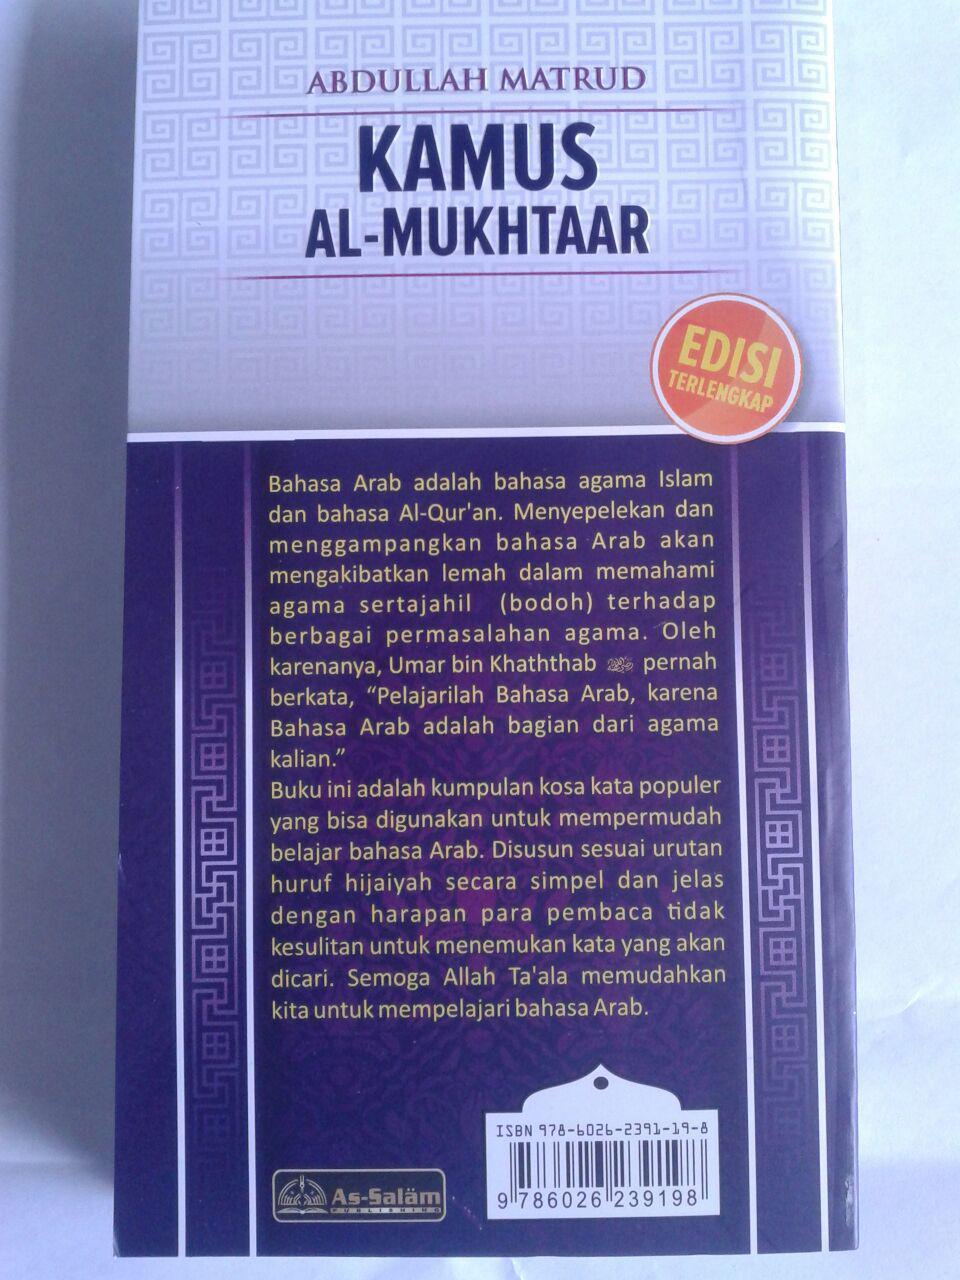 Buku Kamus Al-Mukhtaar 5000 Kosakata Yang Paling Sering Muncul cover